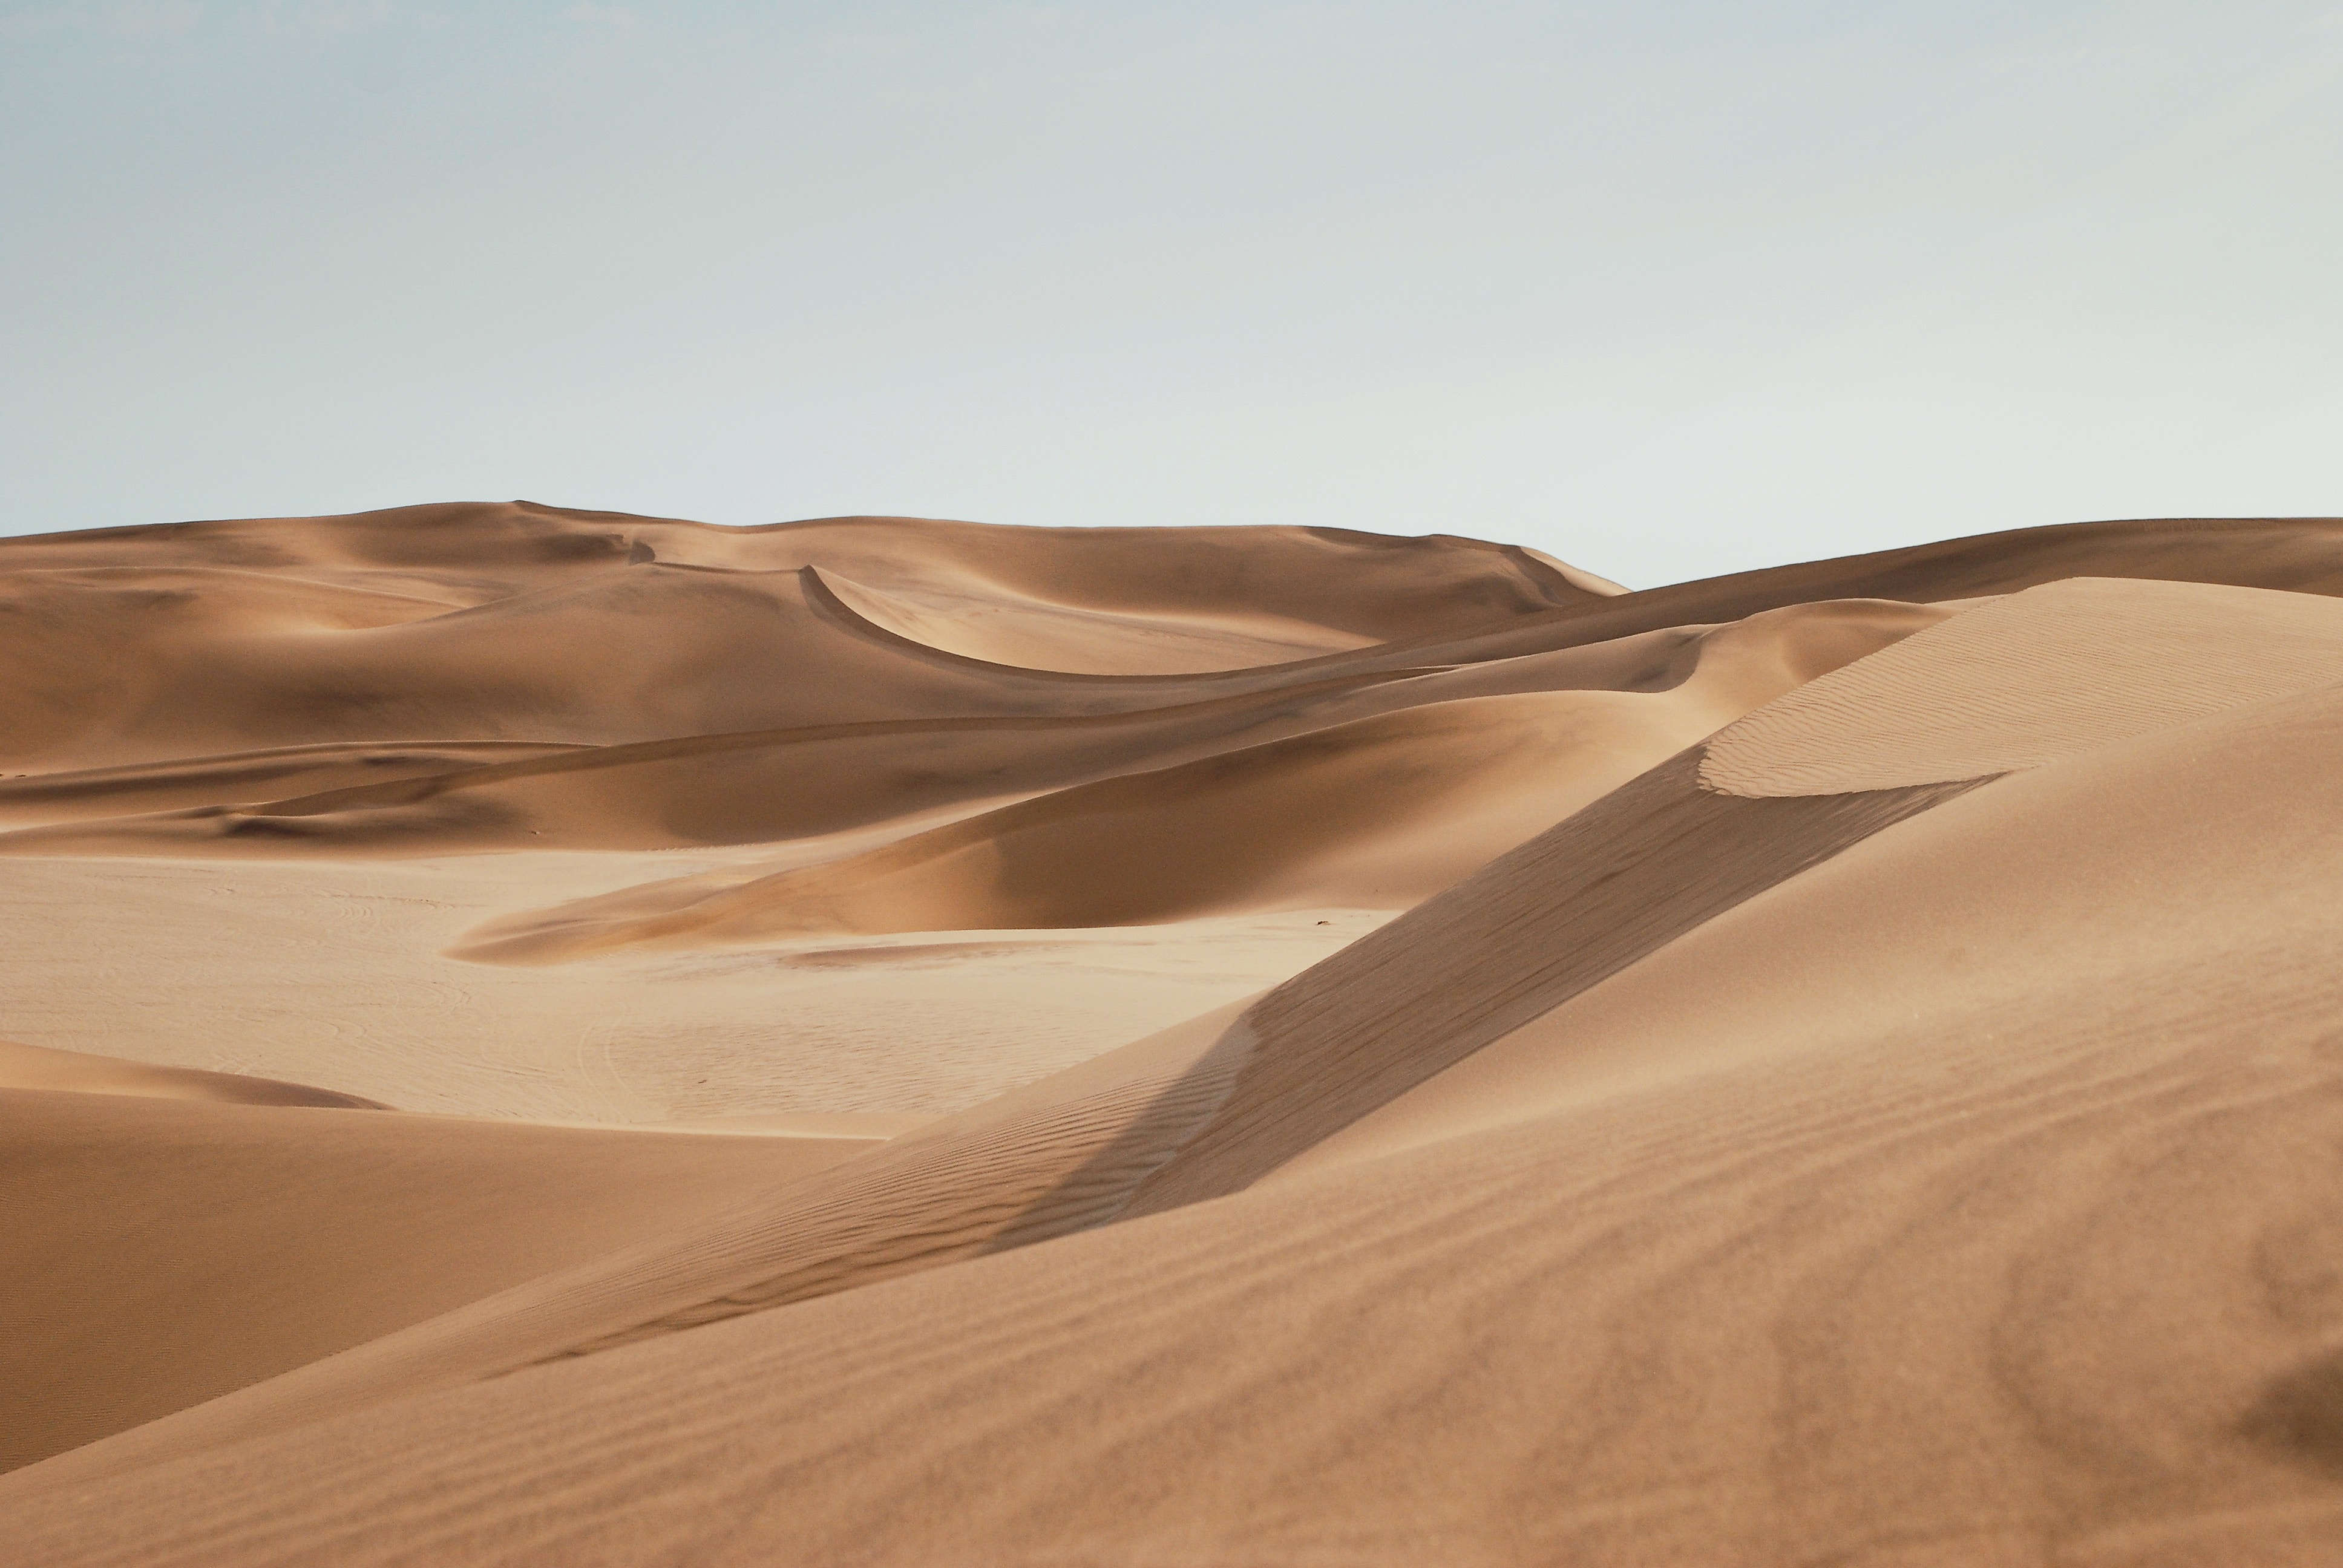 Mad Max – Namib desert, Namibia